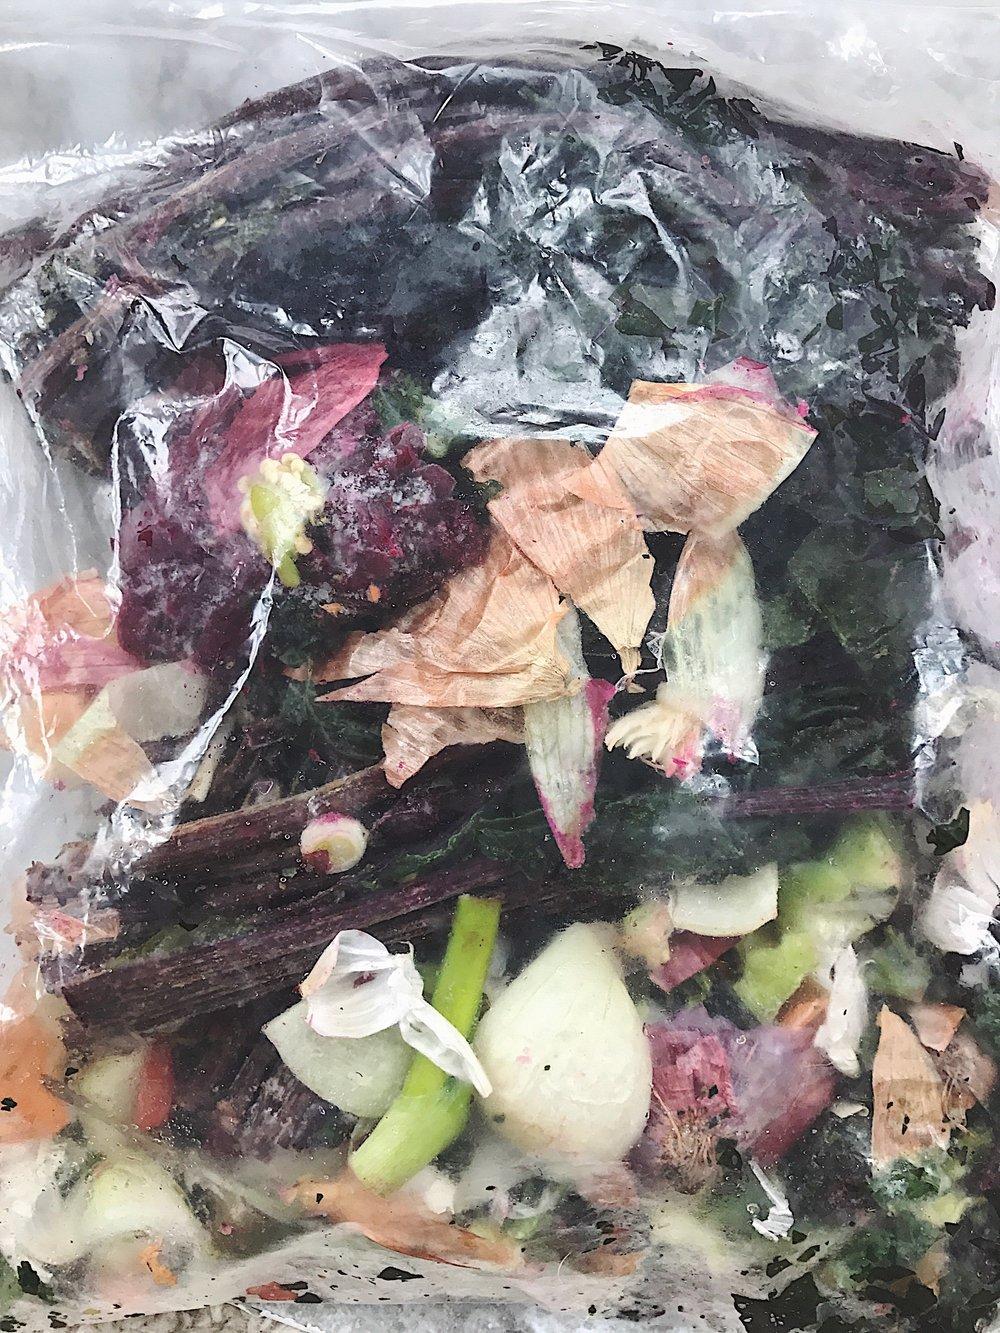 veggie scraps.jpg